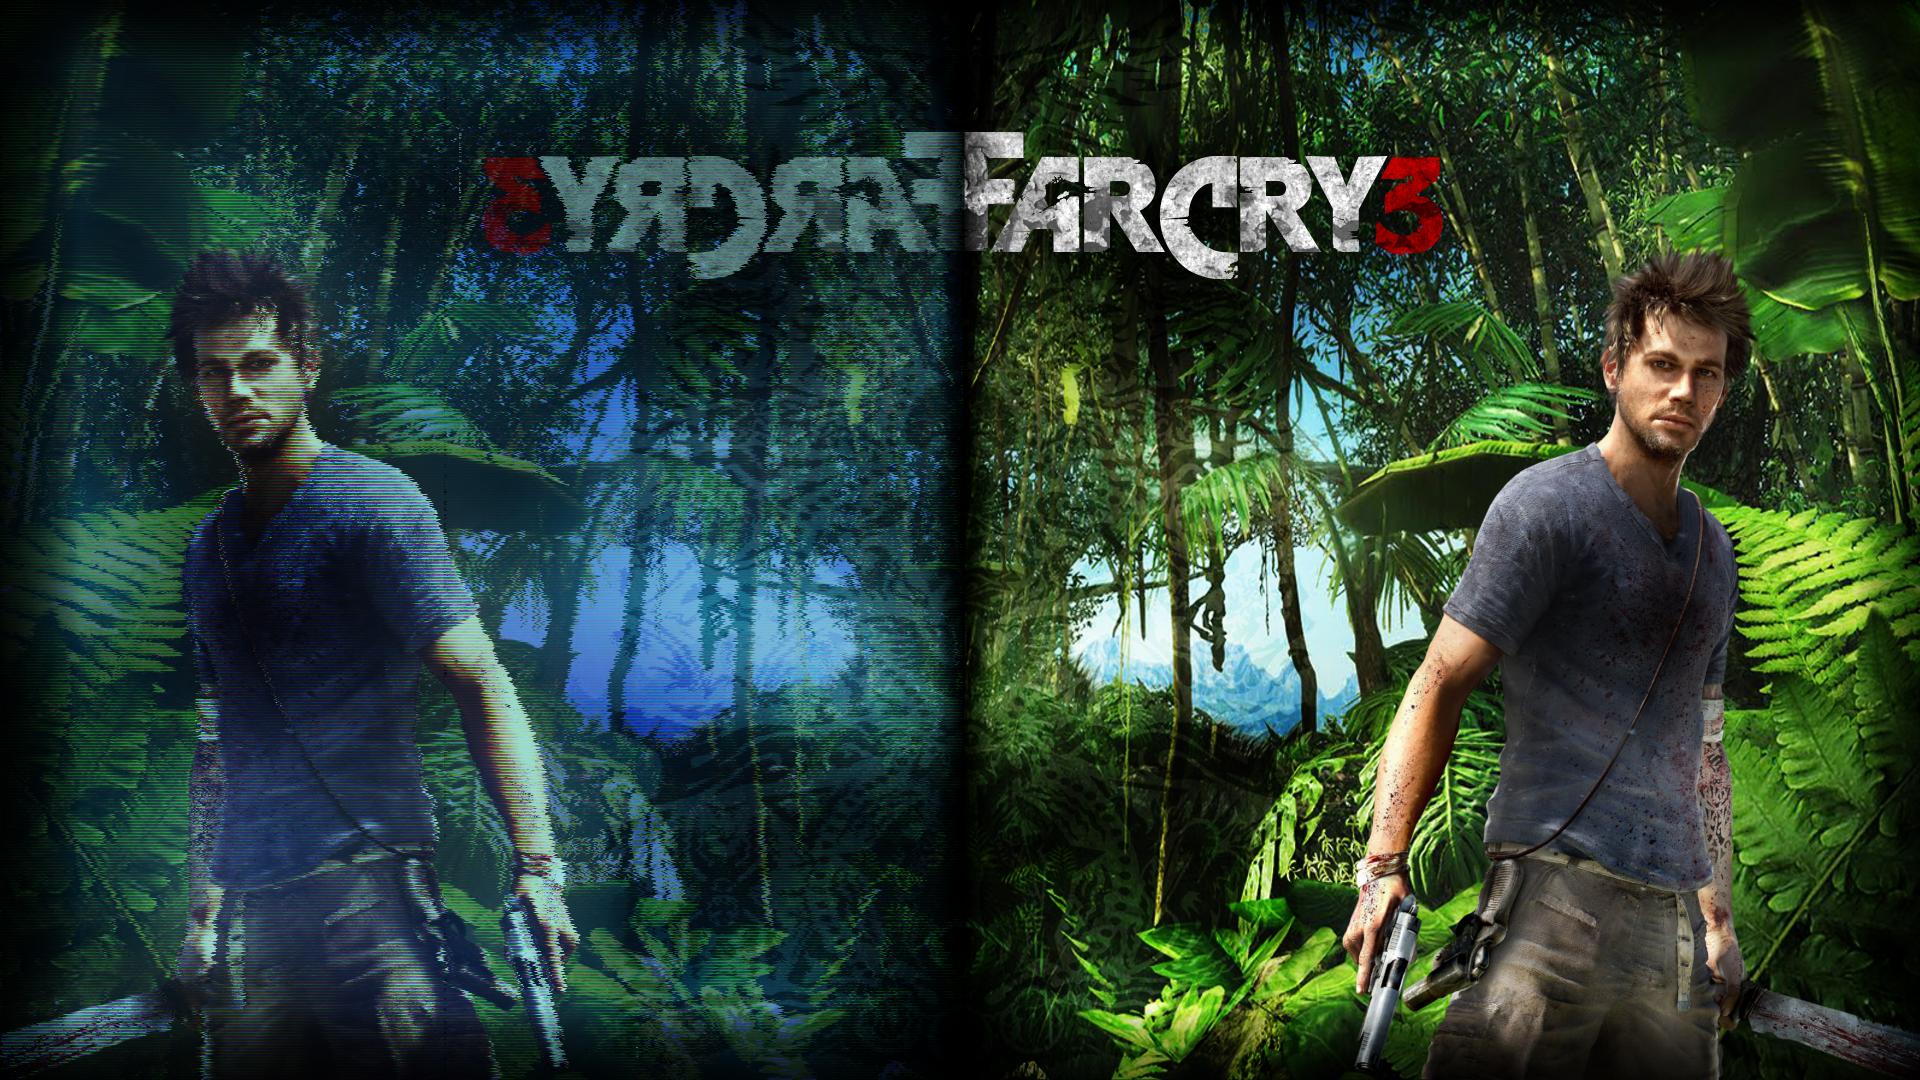 Far Cry 3 Wallpaper By Peneiopie On Deviantart